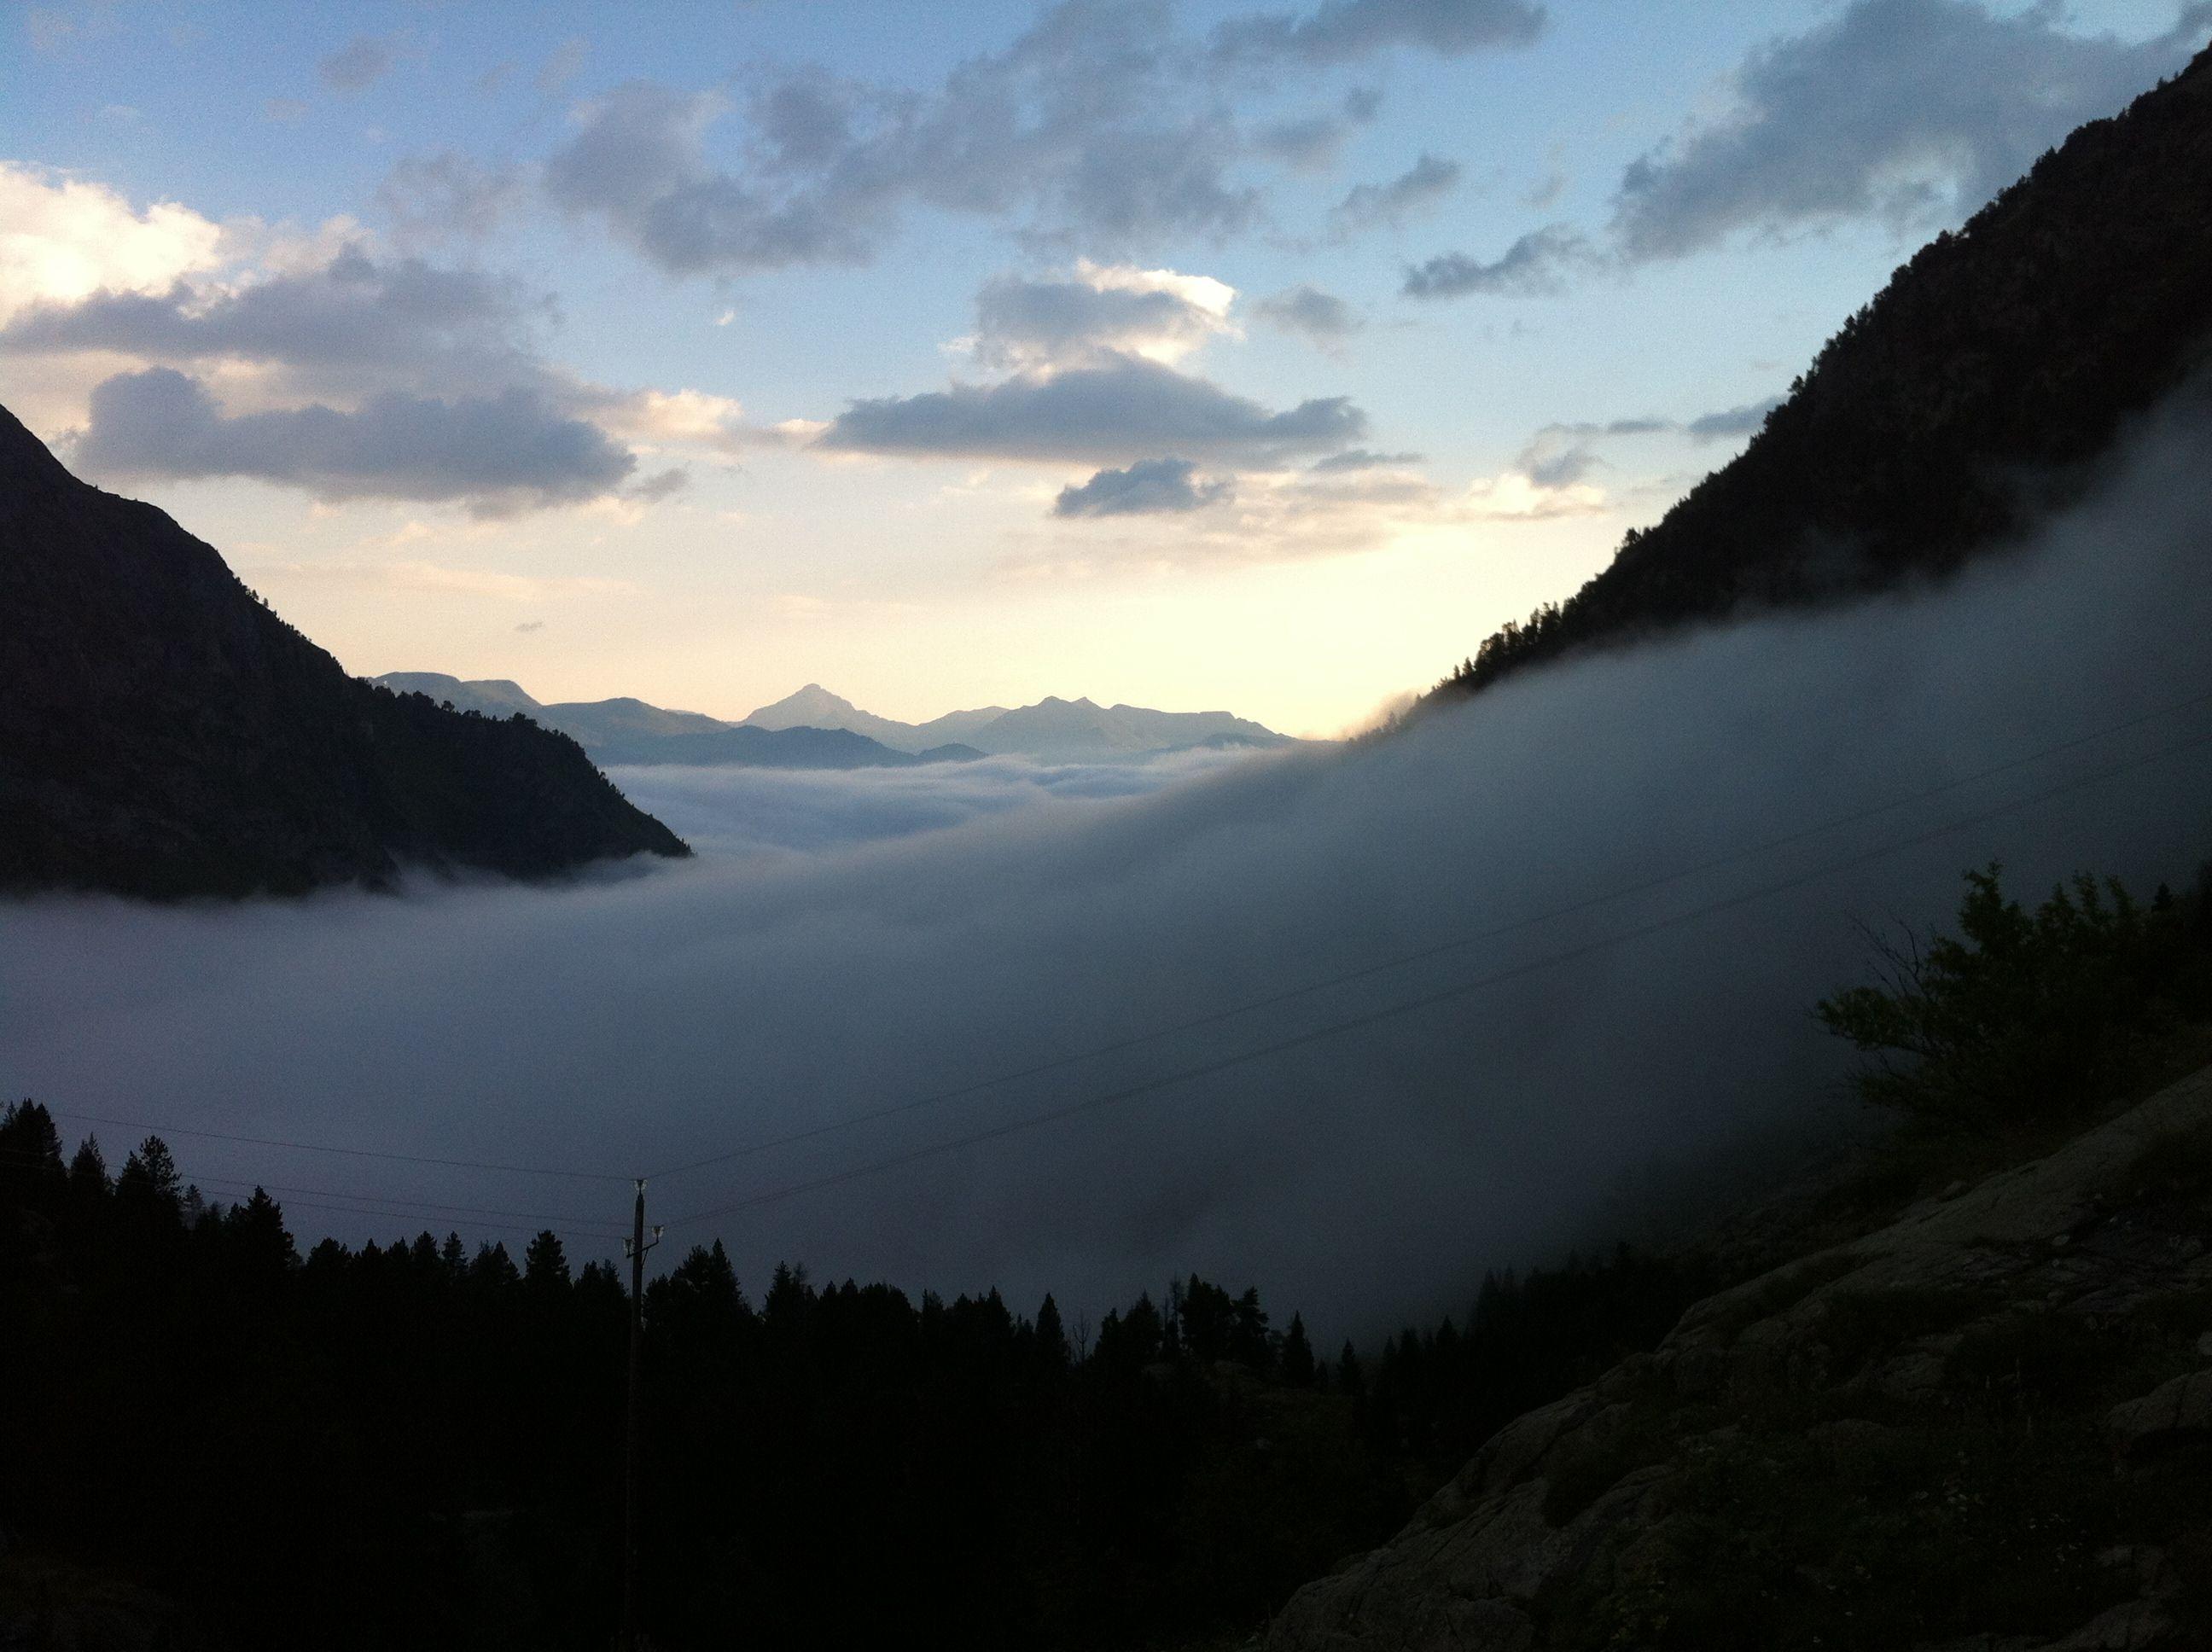 mist in the valleys of the #Pyrenees www.kokopeli.es